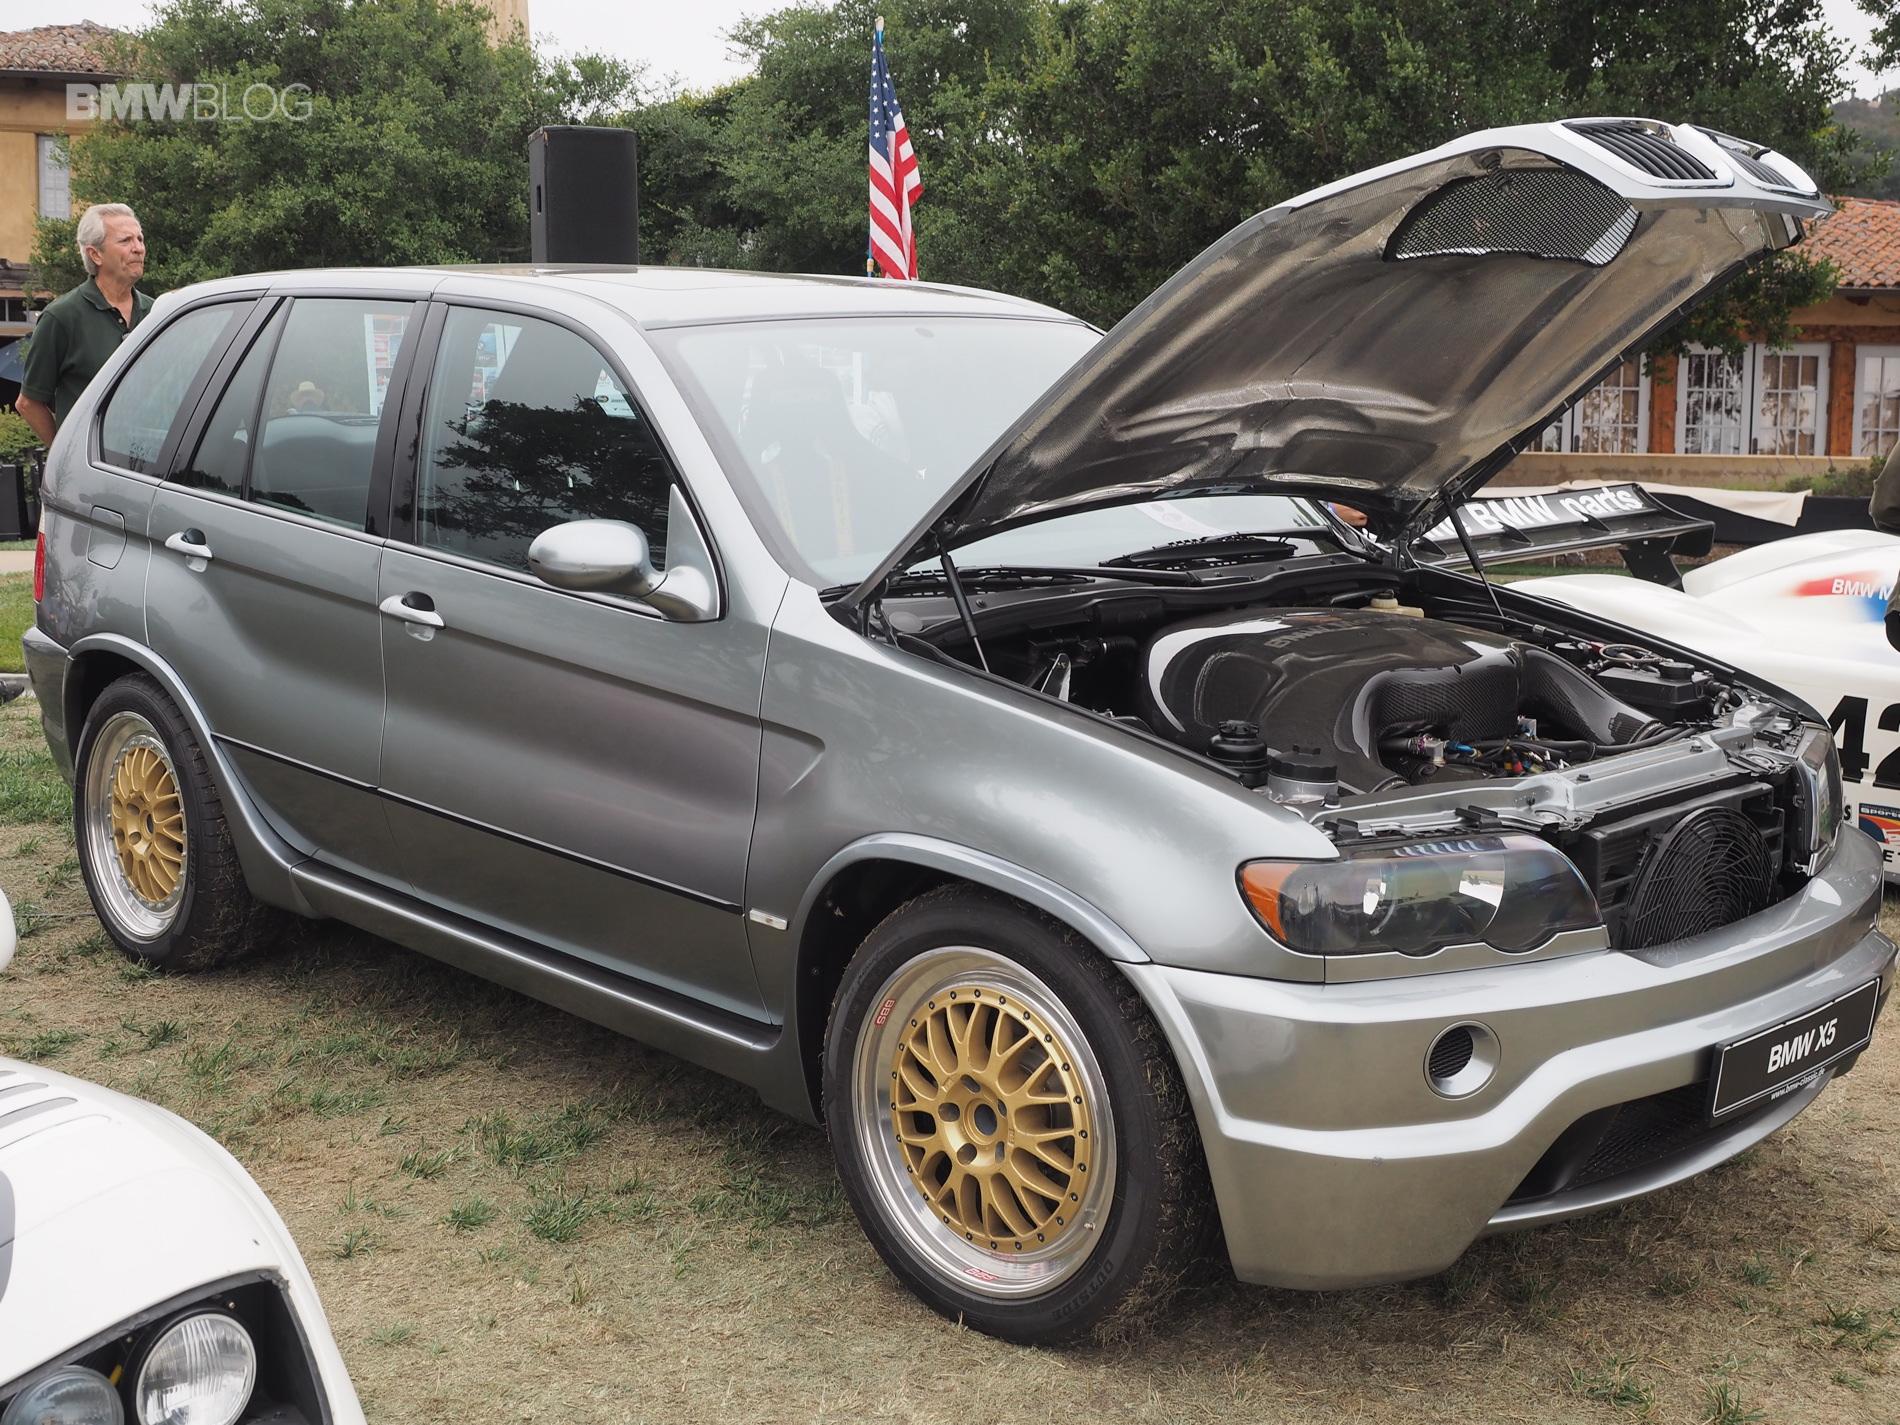 BMW X5 Lemans LOTA 8